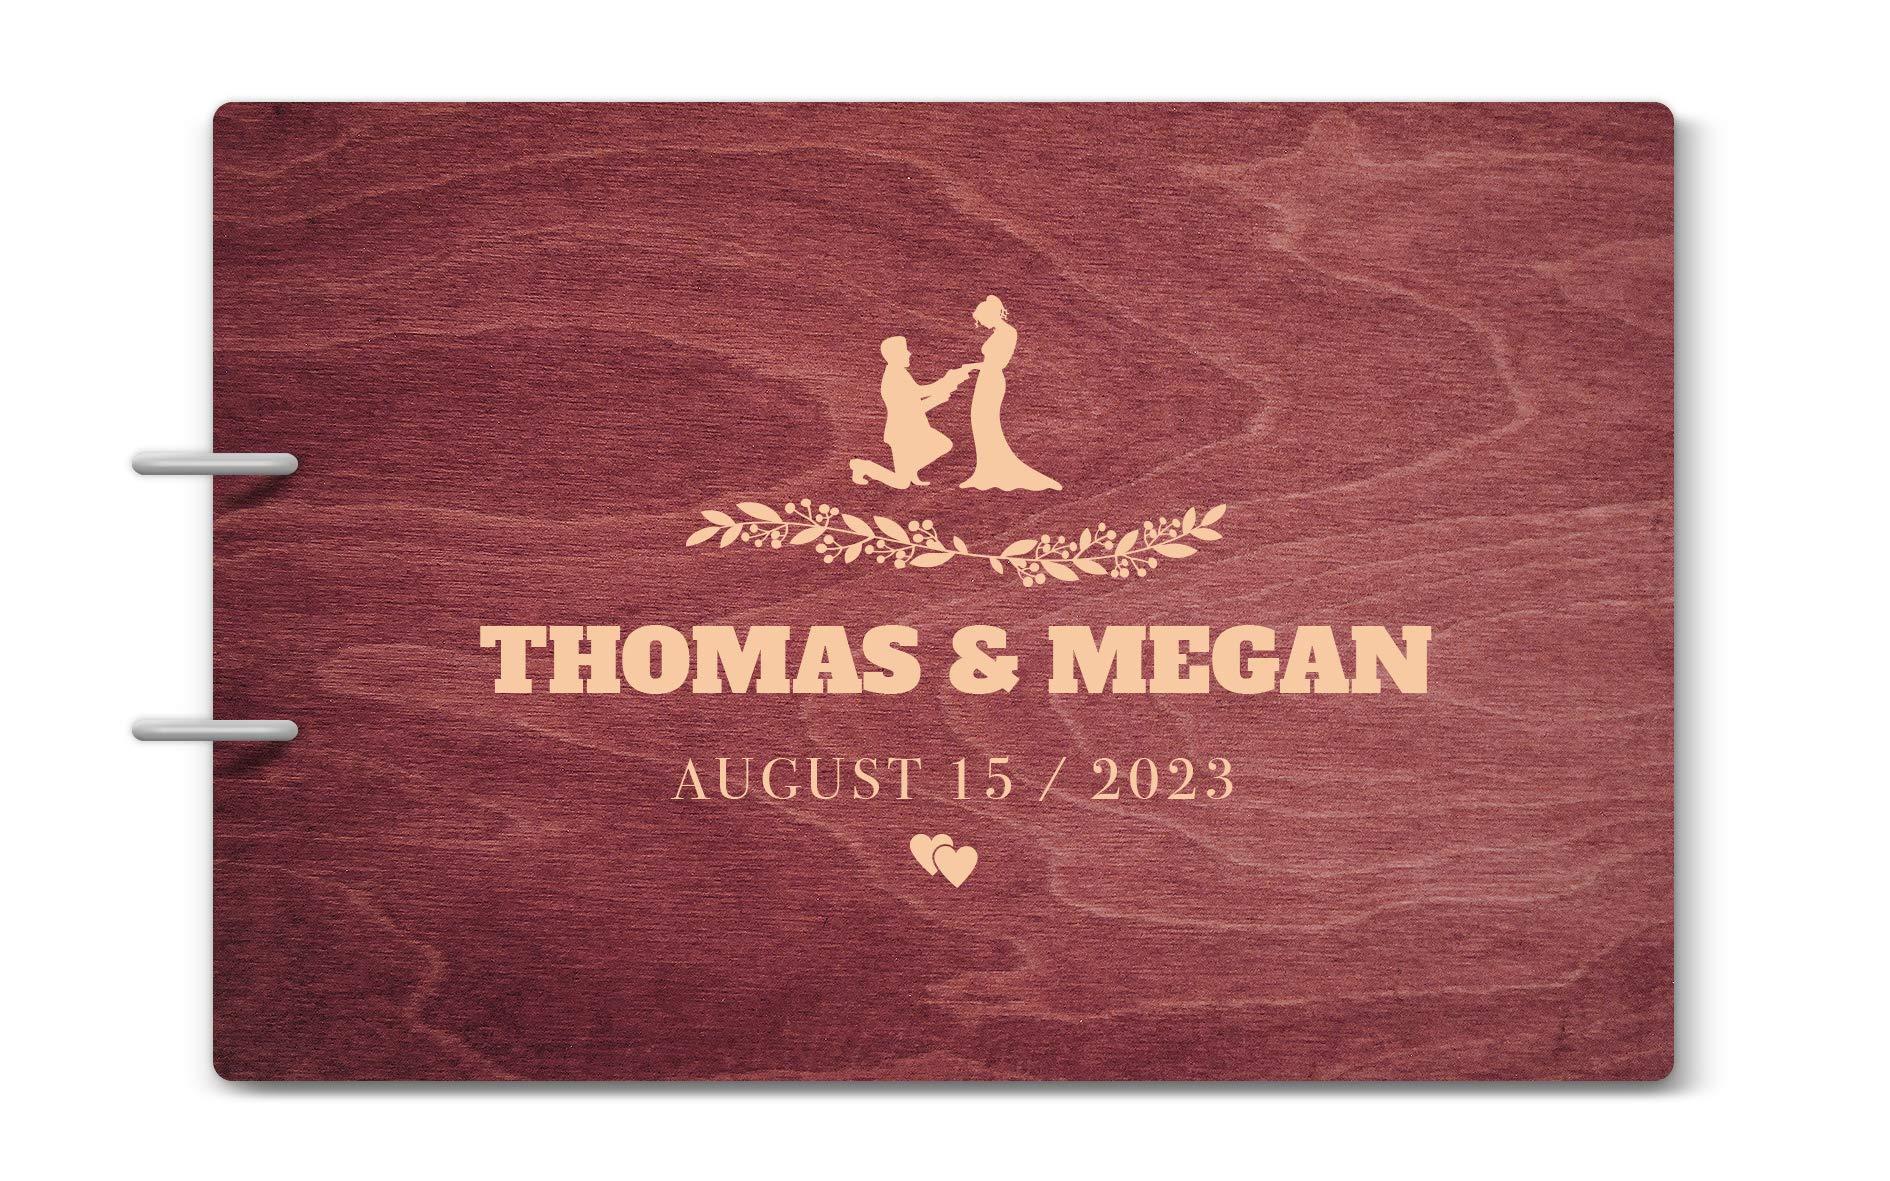 Custom Engraved Wooden Rustic Vintage Wedding Guest Book - Personalized Mr. & Mrs. Wreathe Monogrammed Guestbook - 11 Rose